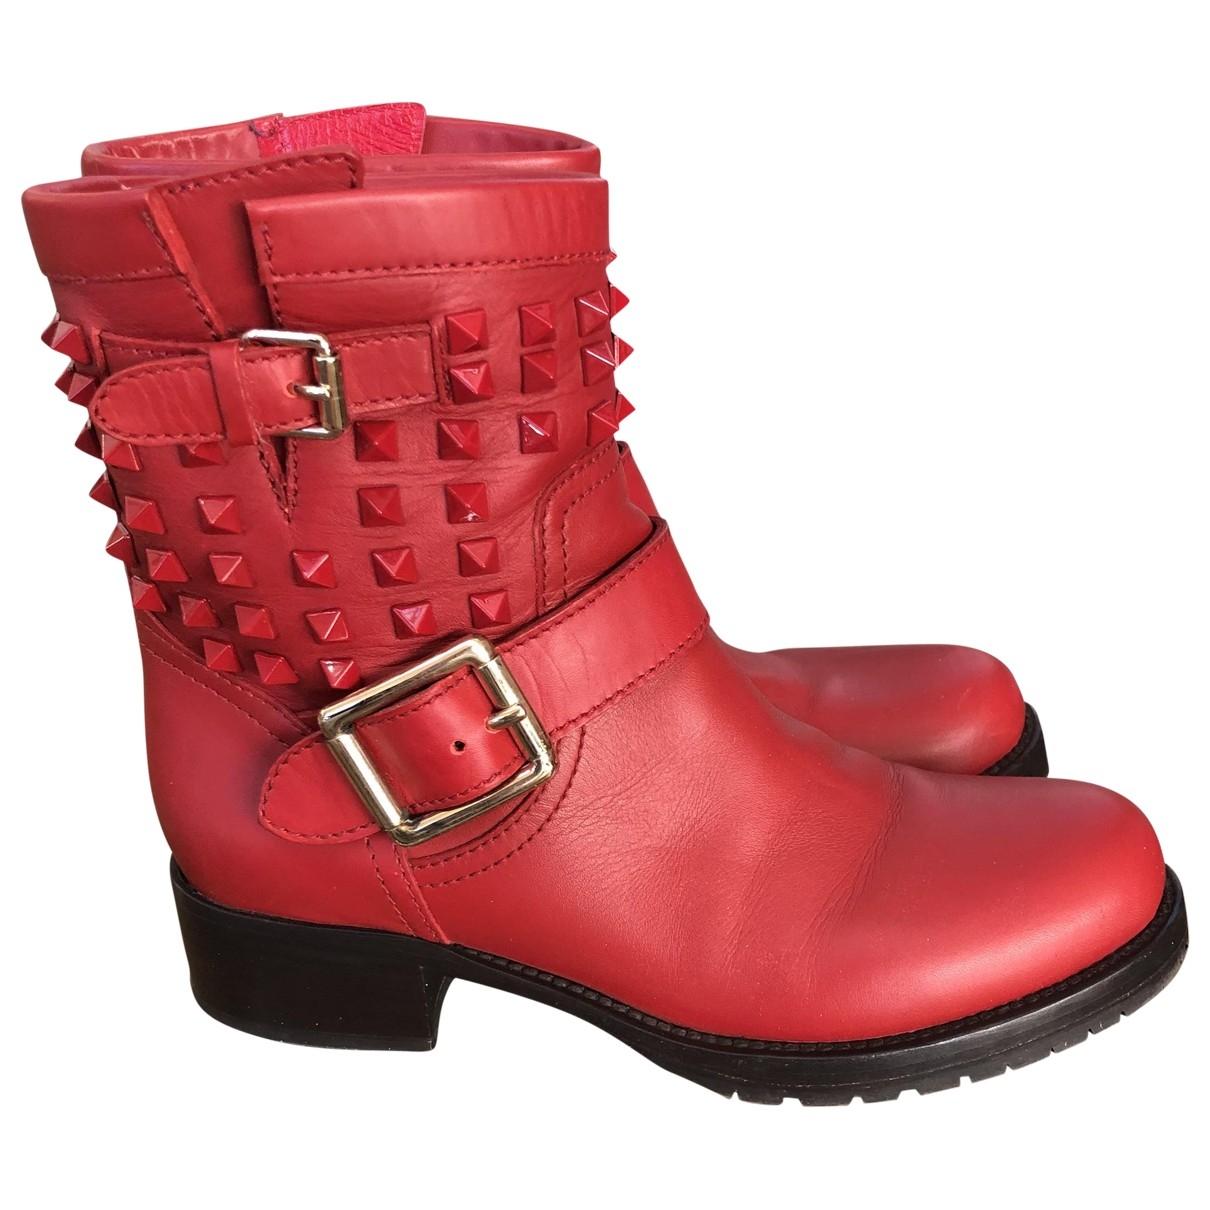 Valentino Garavani Rockstud Stiefeletten in  Rot Leder